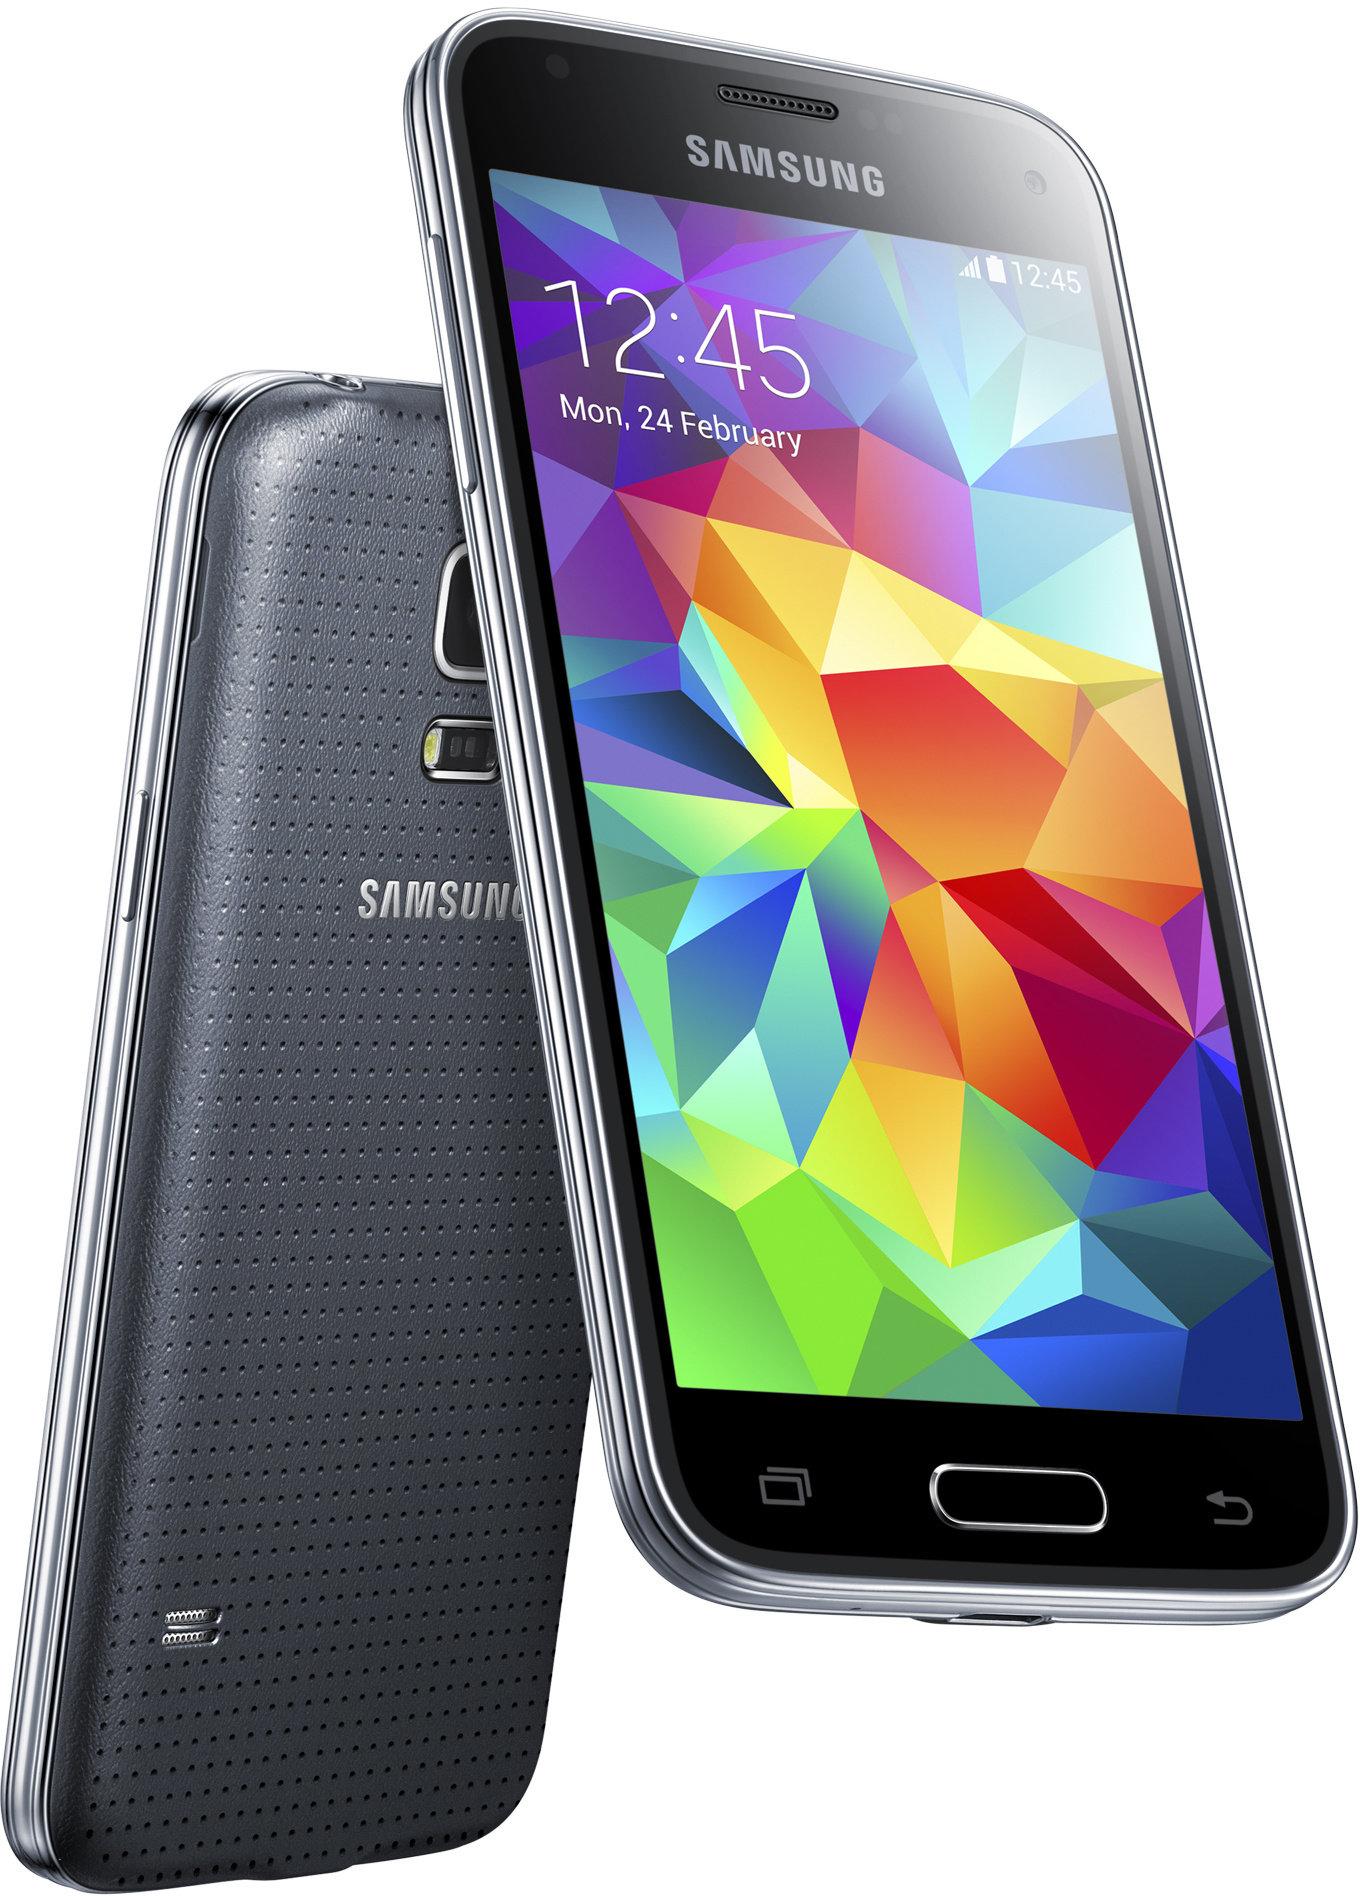 Samsung Galaxy S5 mini - Black